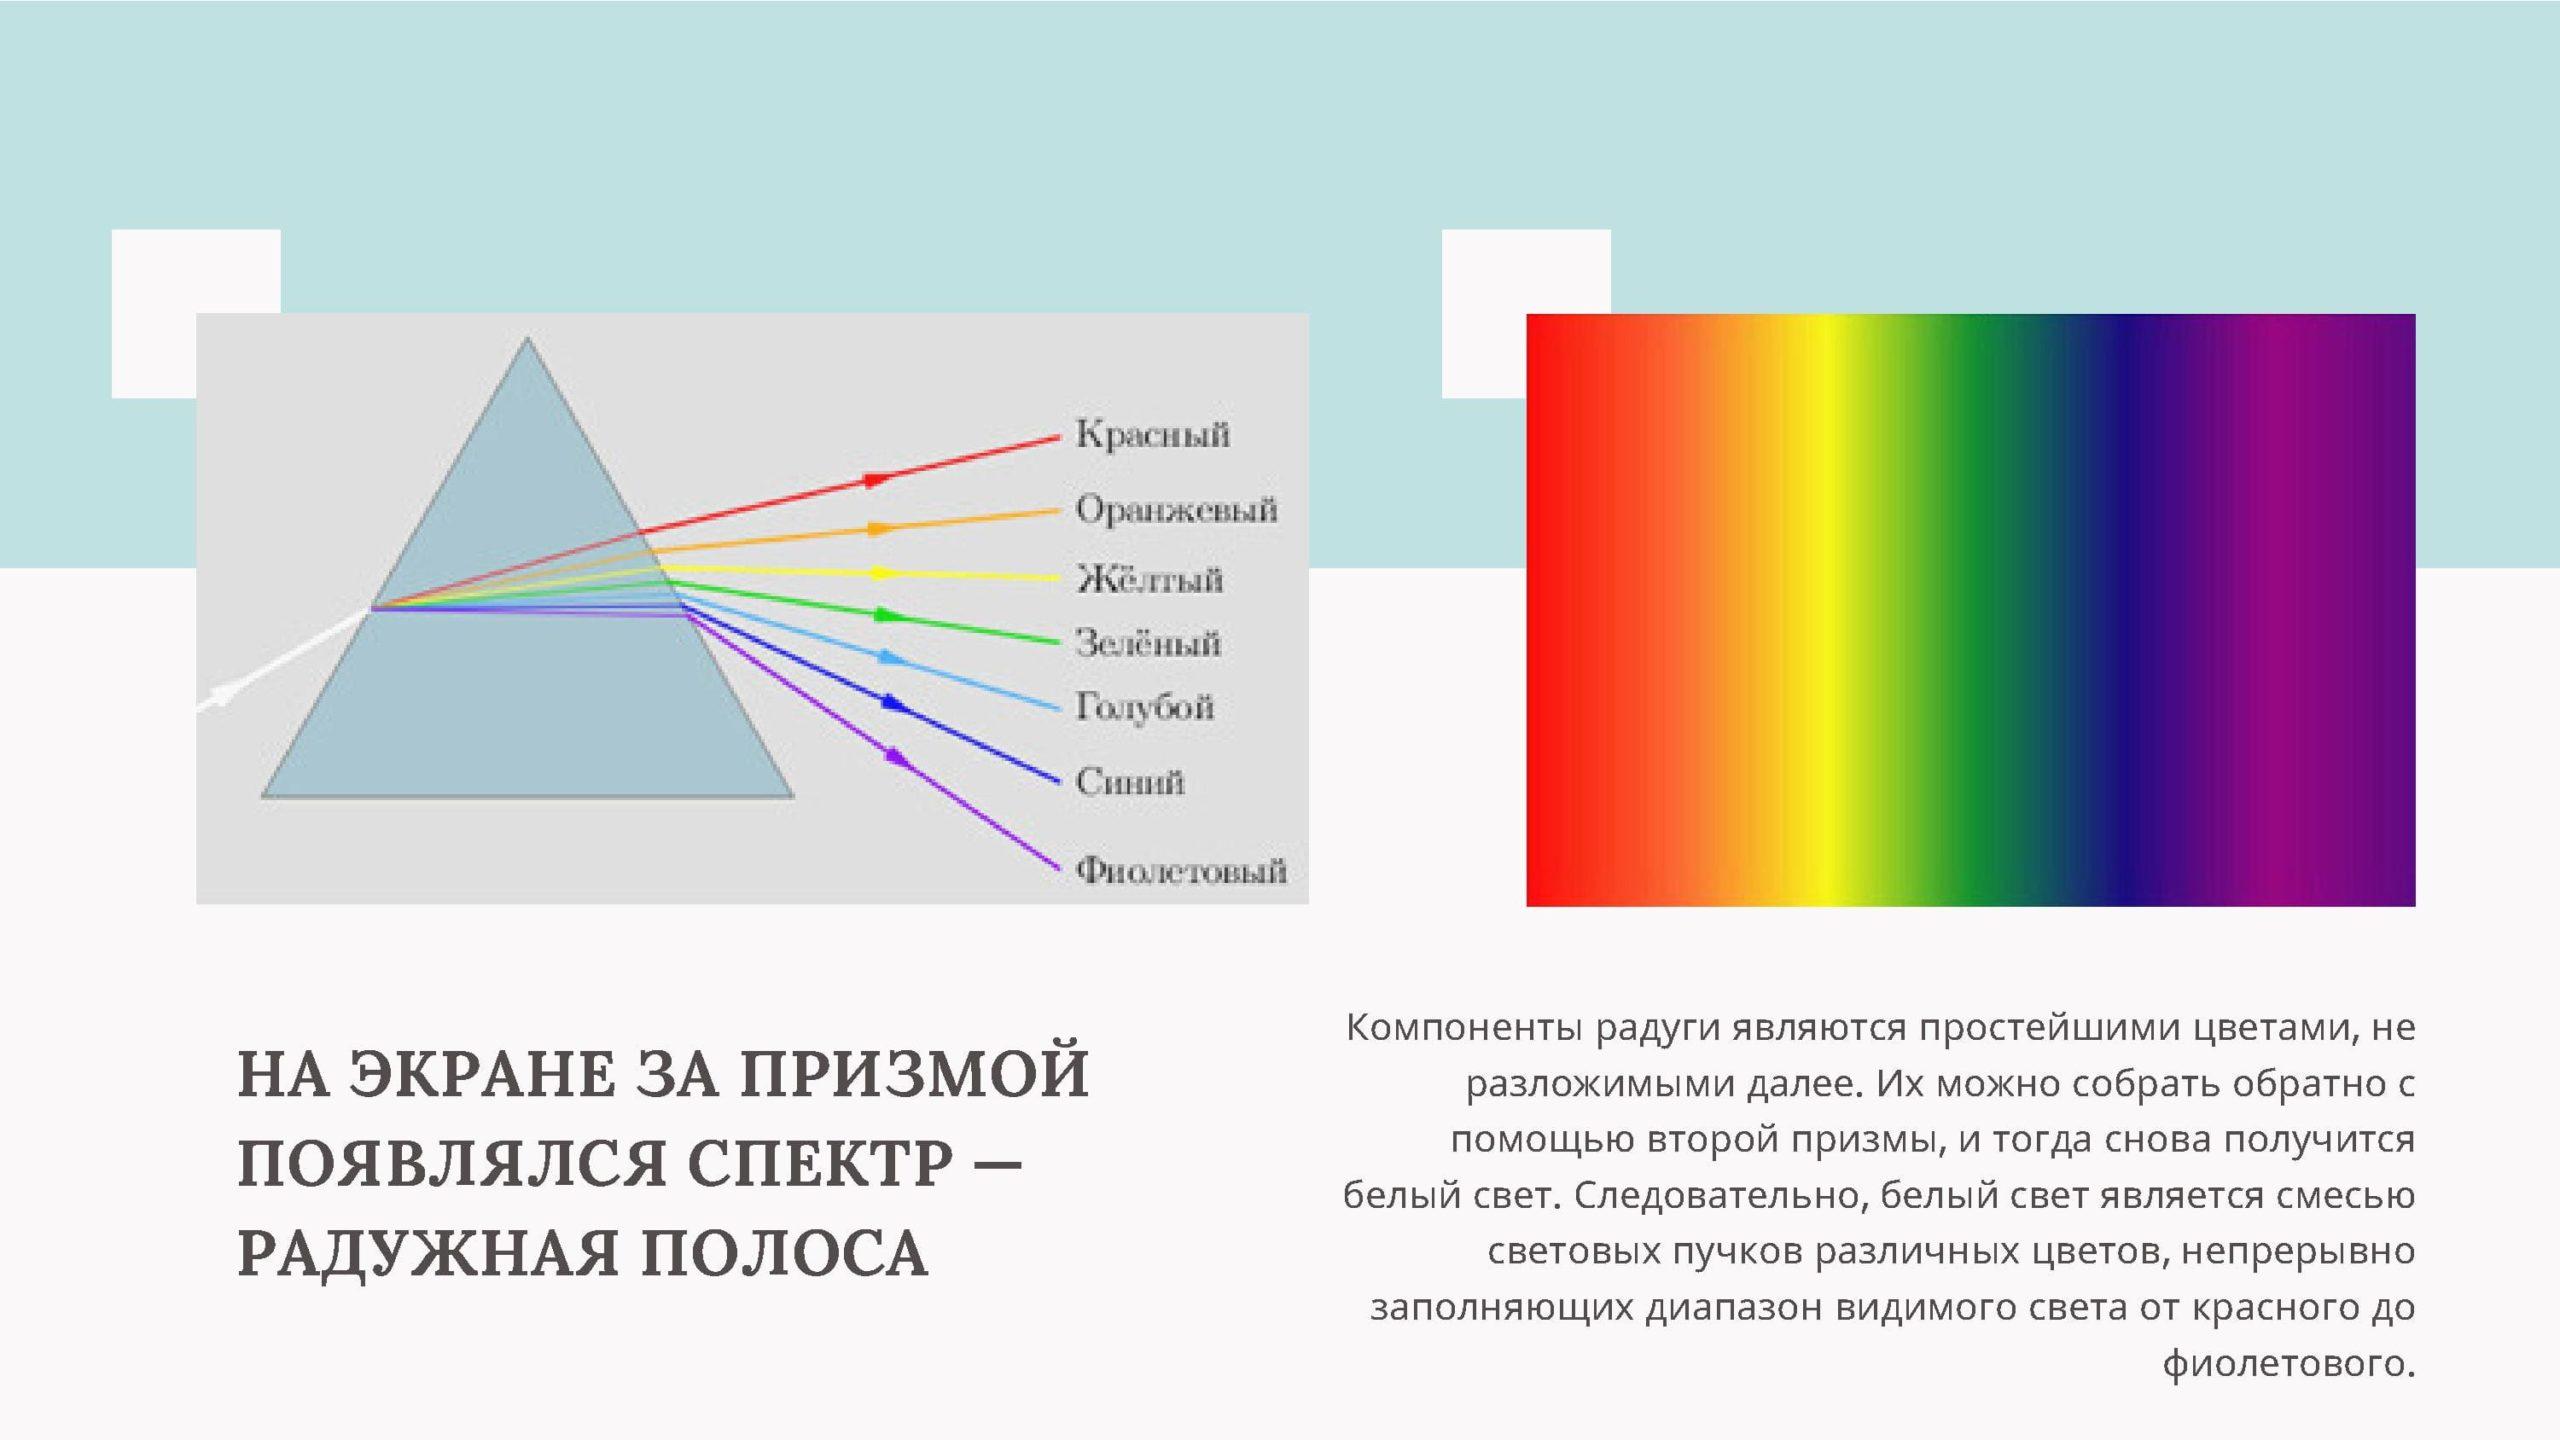 На экране за призмой появлялся спектр - радужная полоса